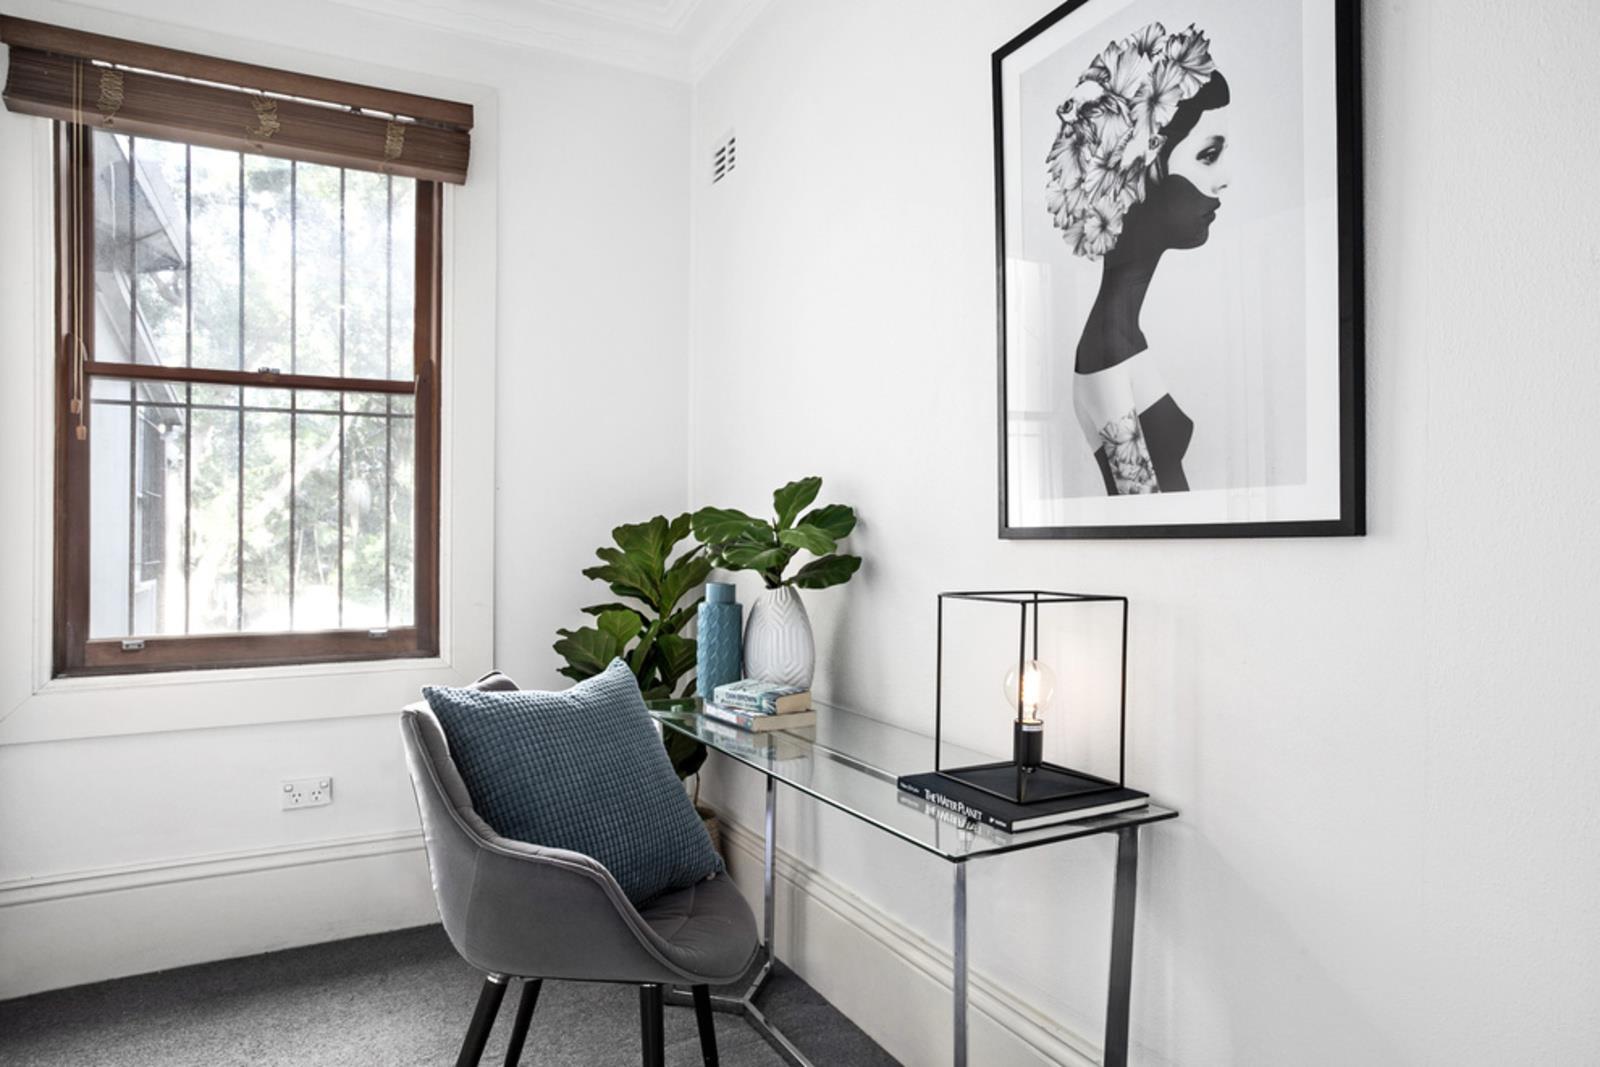 1 17 19 Tupper Street Enmore NSW 2042 Sale Rental History